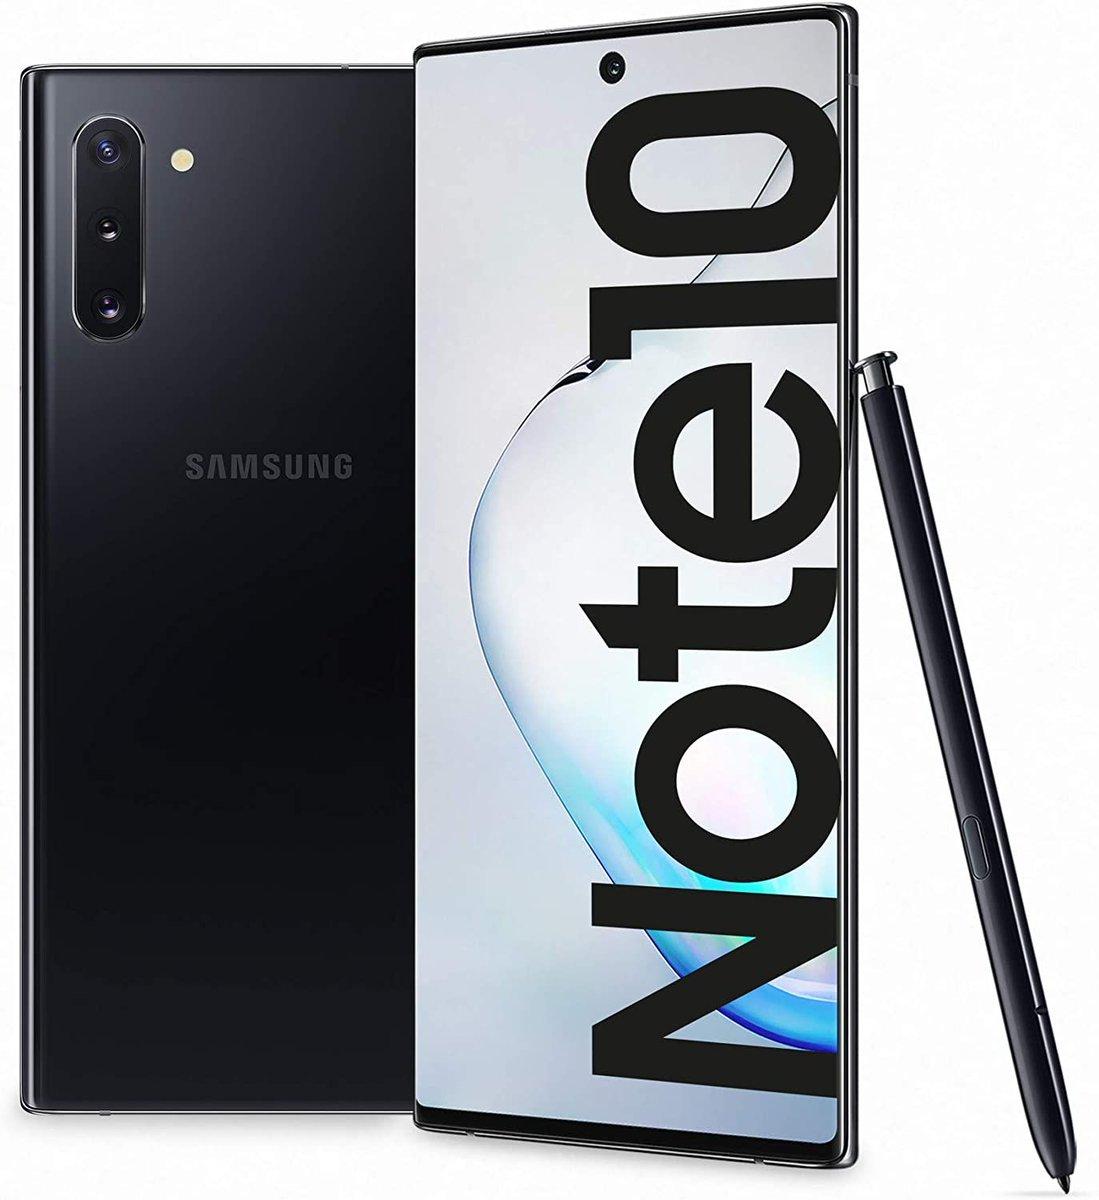 "Samsung Galaxy Note 10, Display 6.3"" Dynamic AMOLED, 256 GB Espandibili, SPen Air Action, RAM 8 GB, Batteria 3.500 mAh, 4G, Dual SIM, Android 9 Pie: https://buff.ly/3g77InA #samsung #galaxynote10 #android #smartphone #tech #news #bestprice #phone #mobile #fast #life #storage #rtpic.twitter.com/AK68GRwjTr"